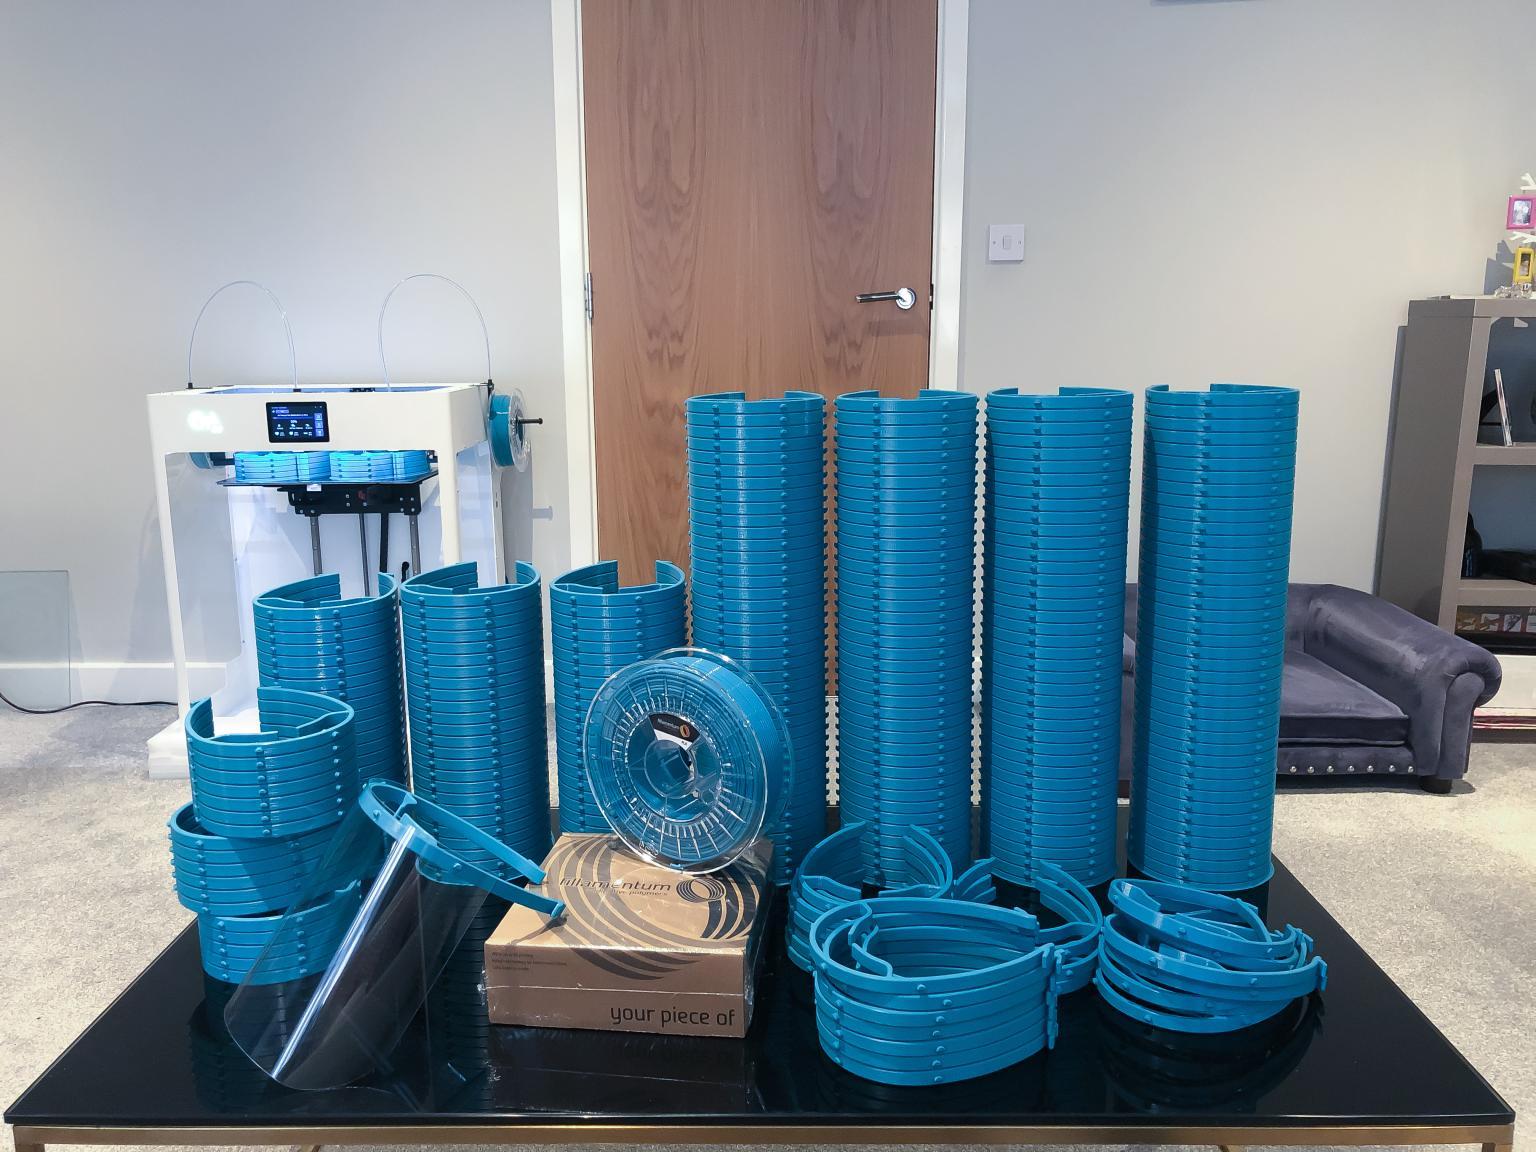 3D printed PPE parts. Photo via Craftbot.